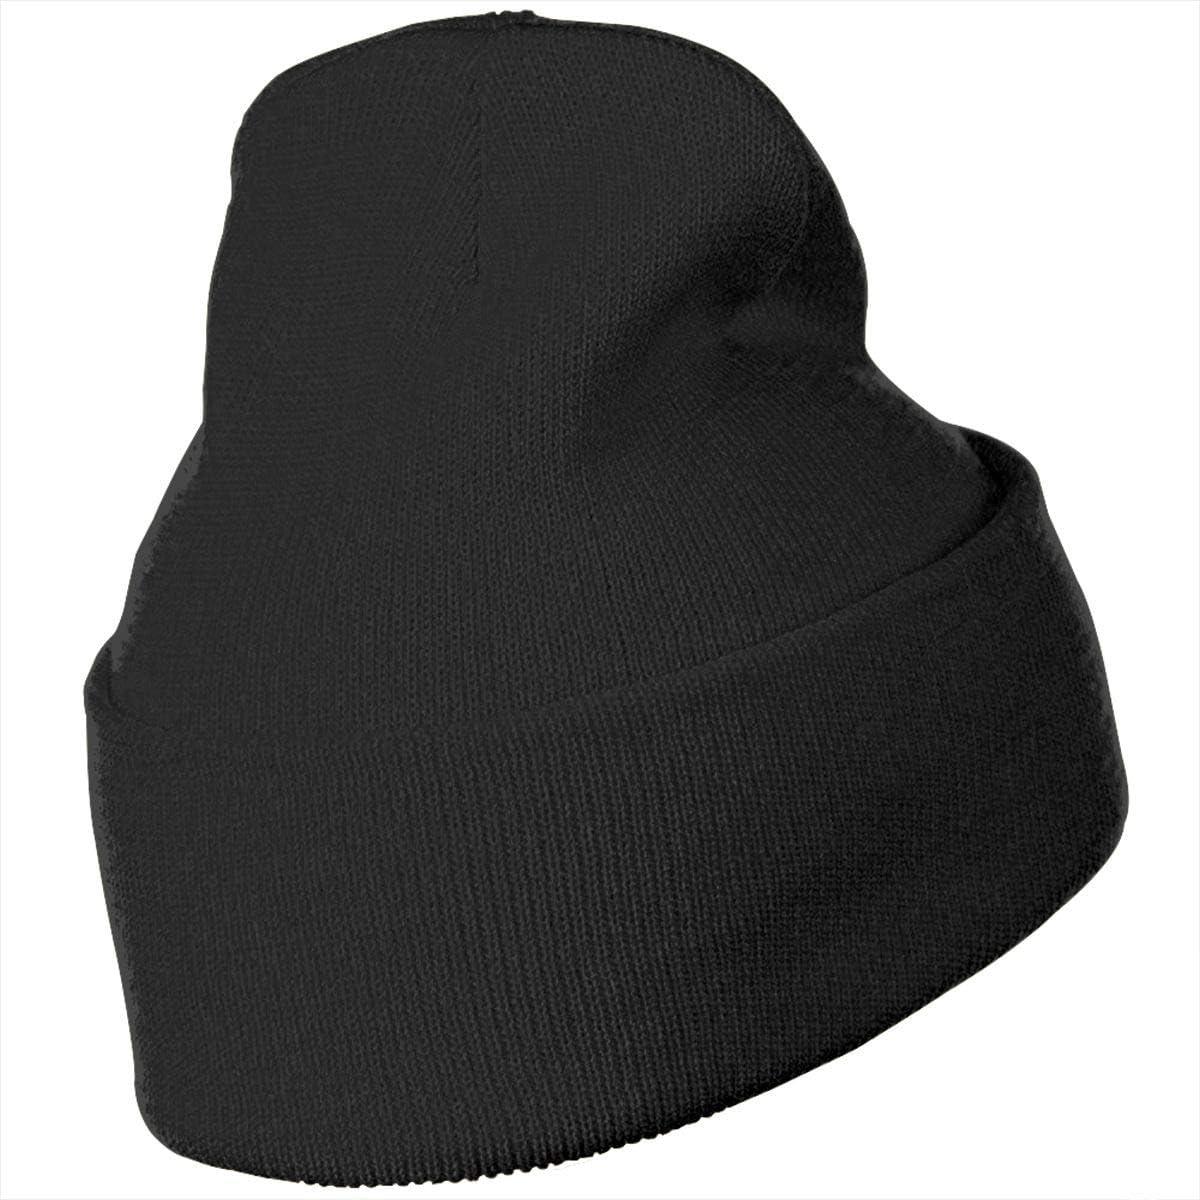 United States Navy Flag Unisex Fashion Knitted Hat Luxury Hip-Hop Cap